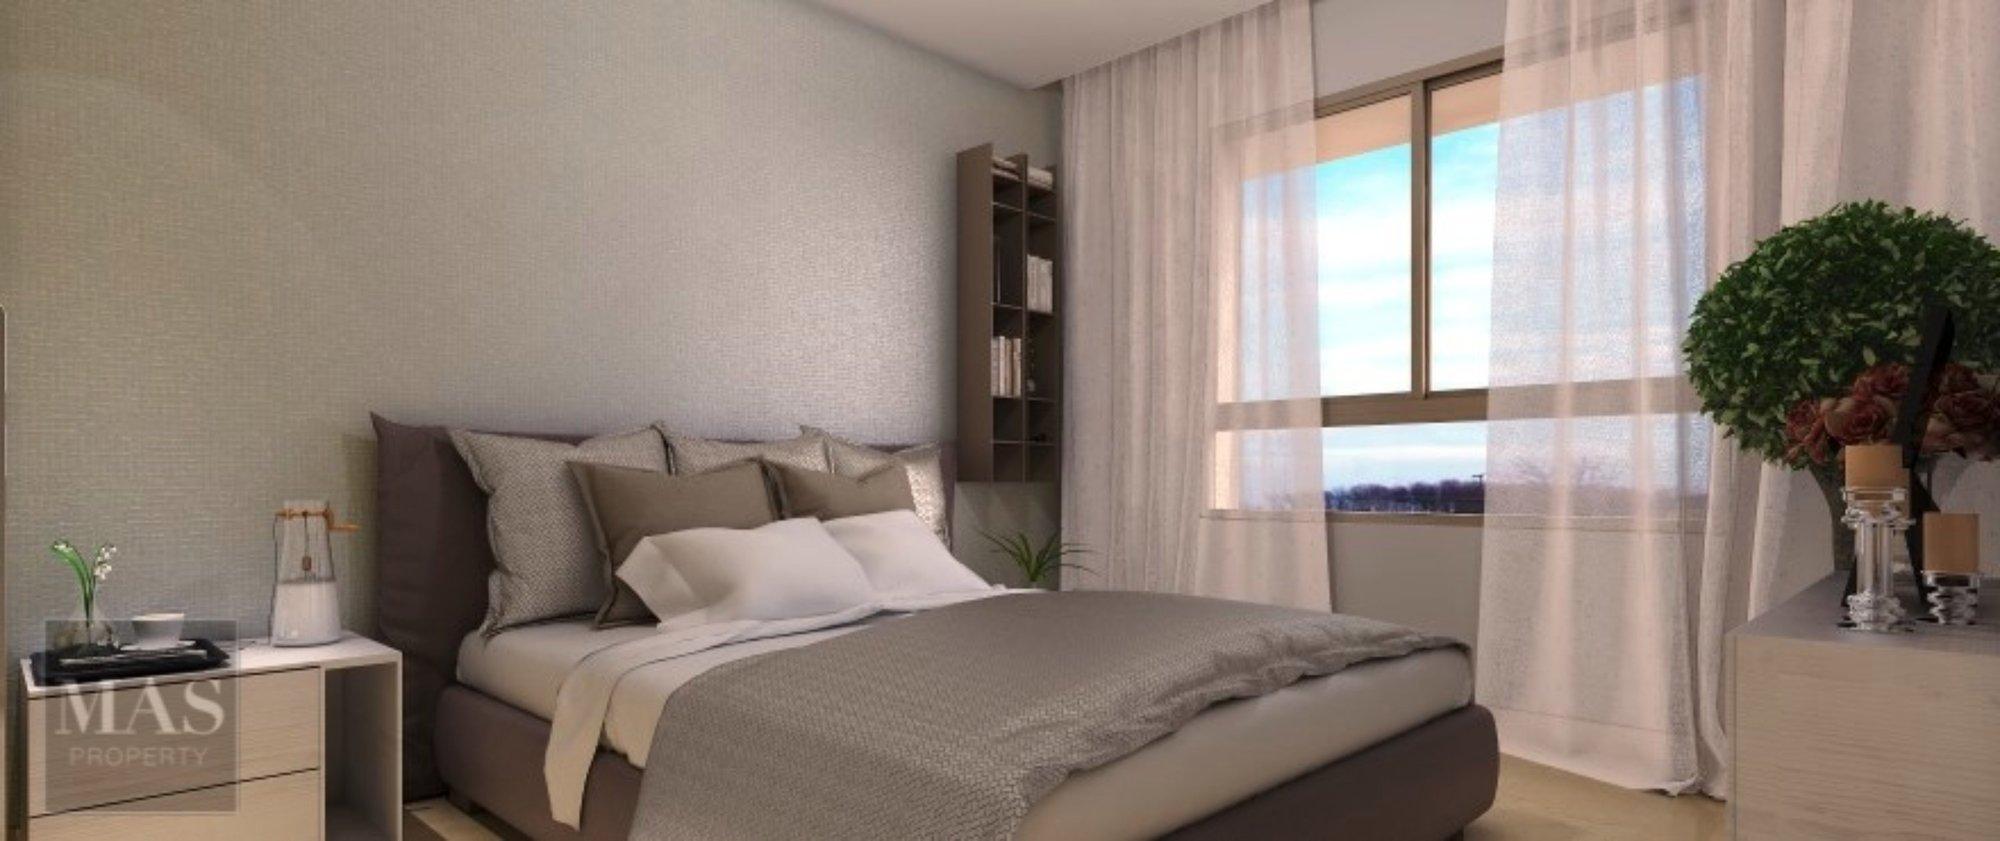 3 bedroom, 2 bathroom townhouse for sale in la cala golf, mijas